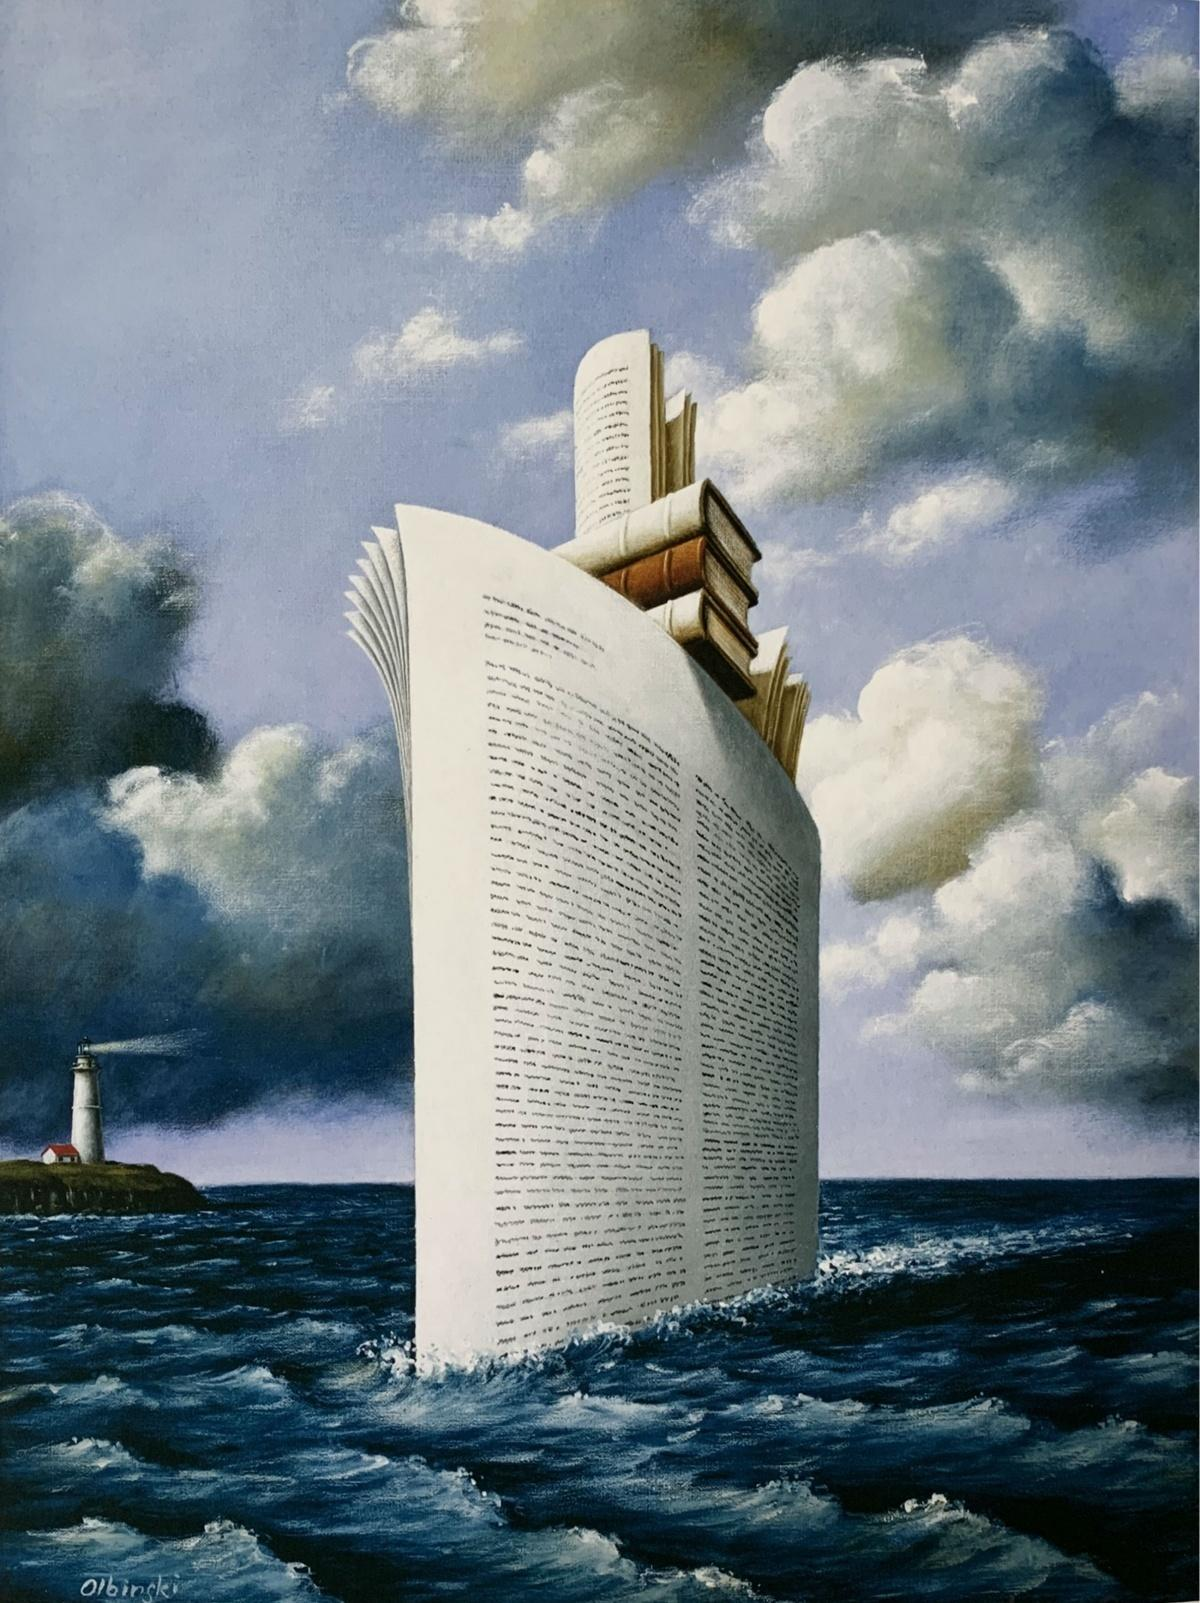 A ship - Figurative Surrealist print, Marine landscape, Blue, Books